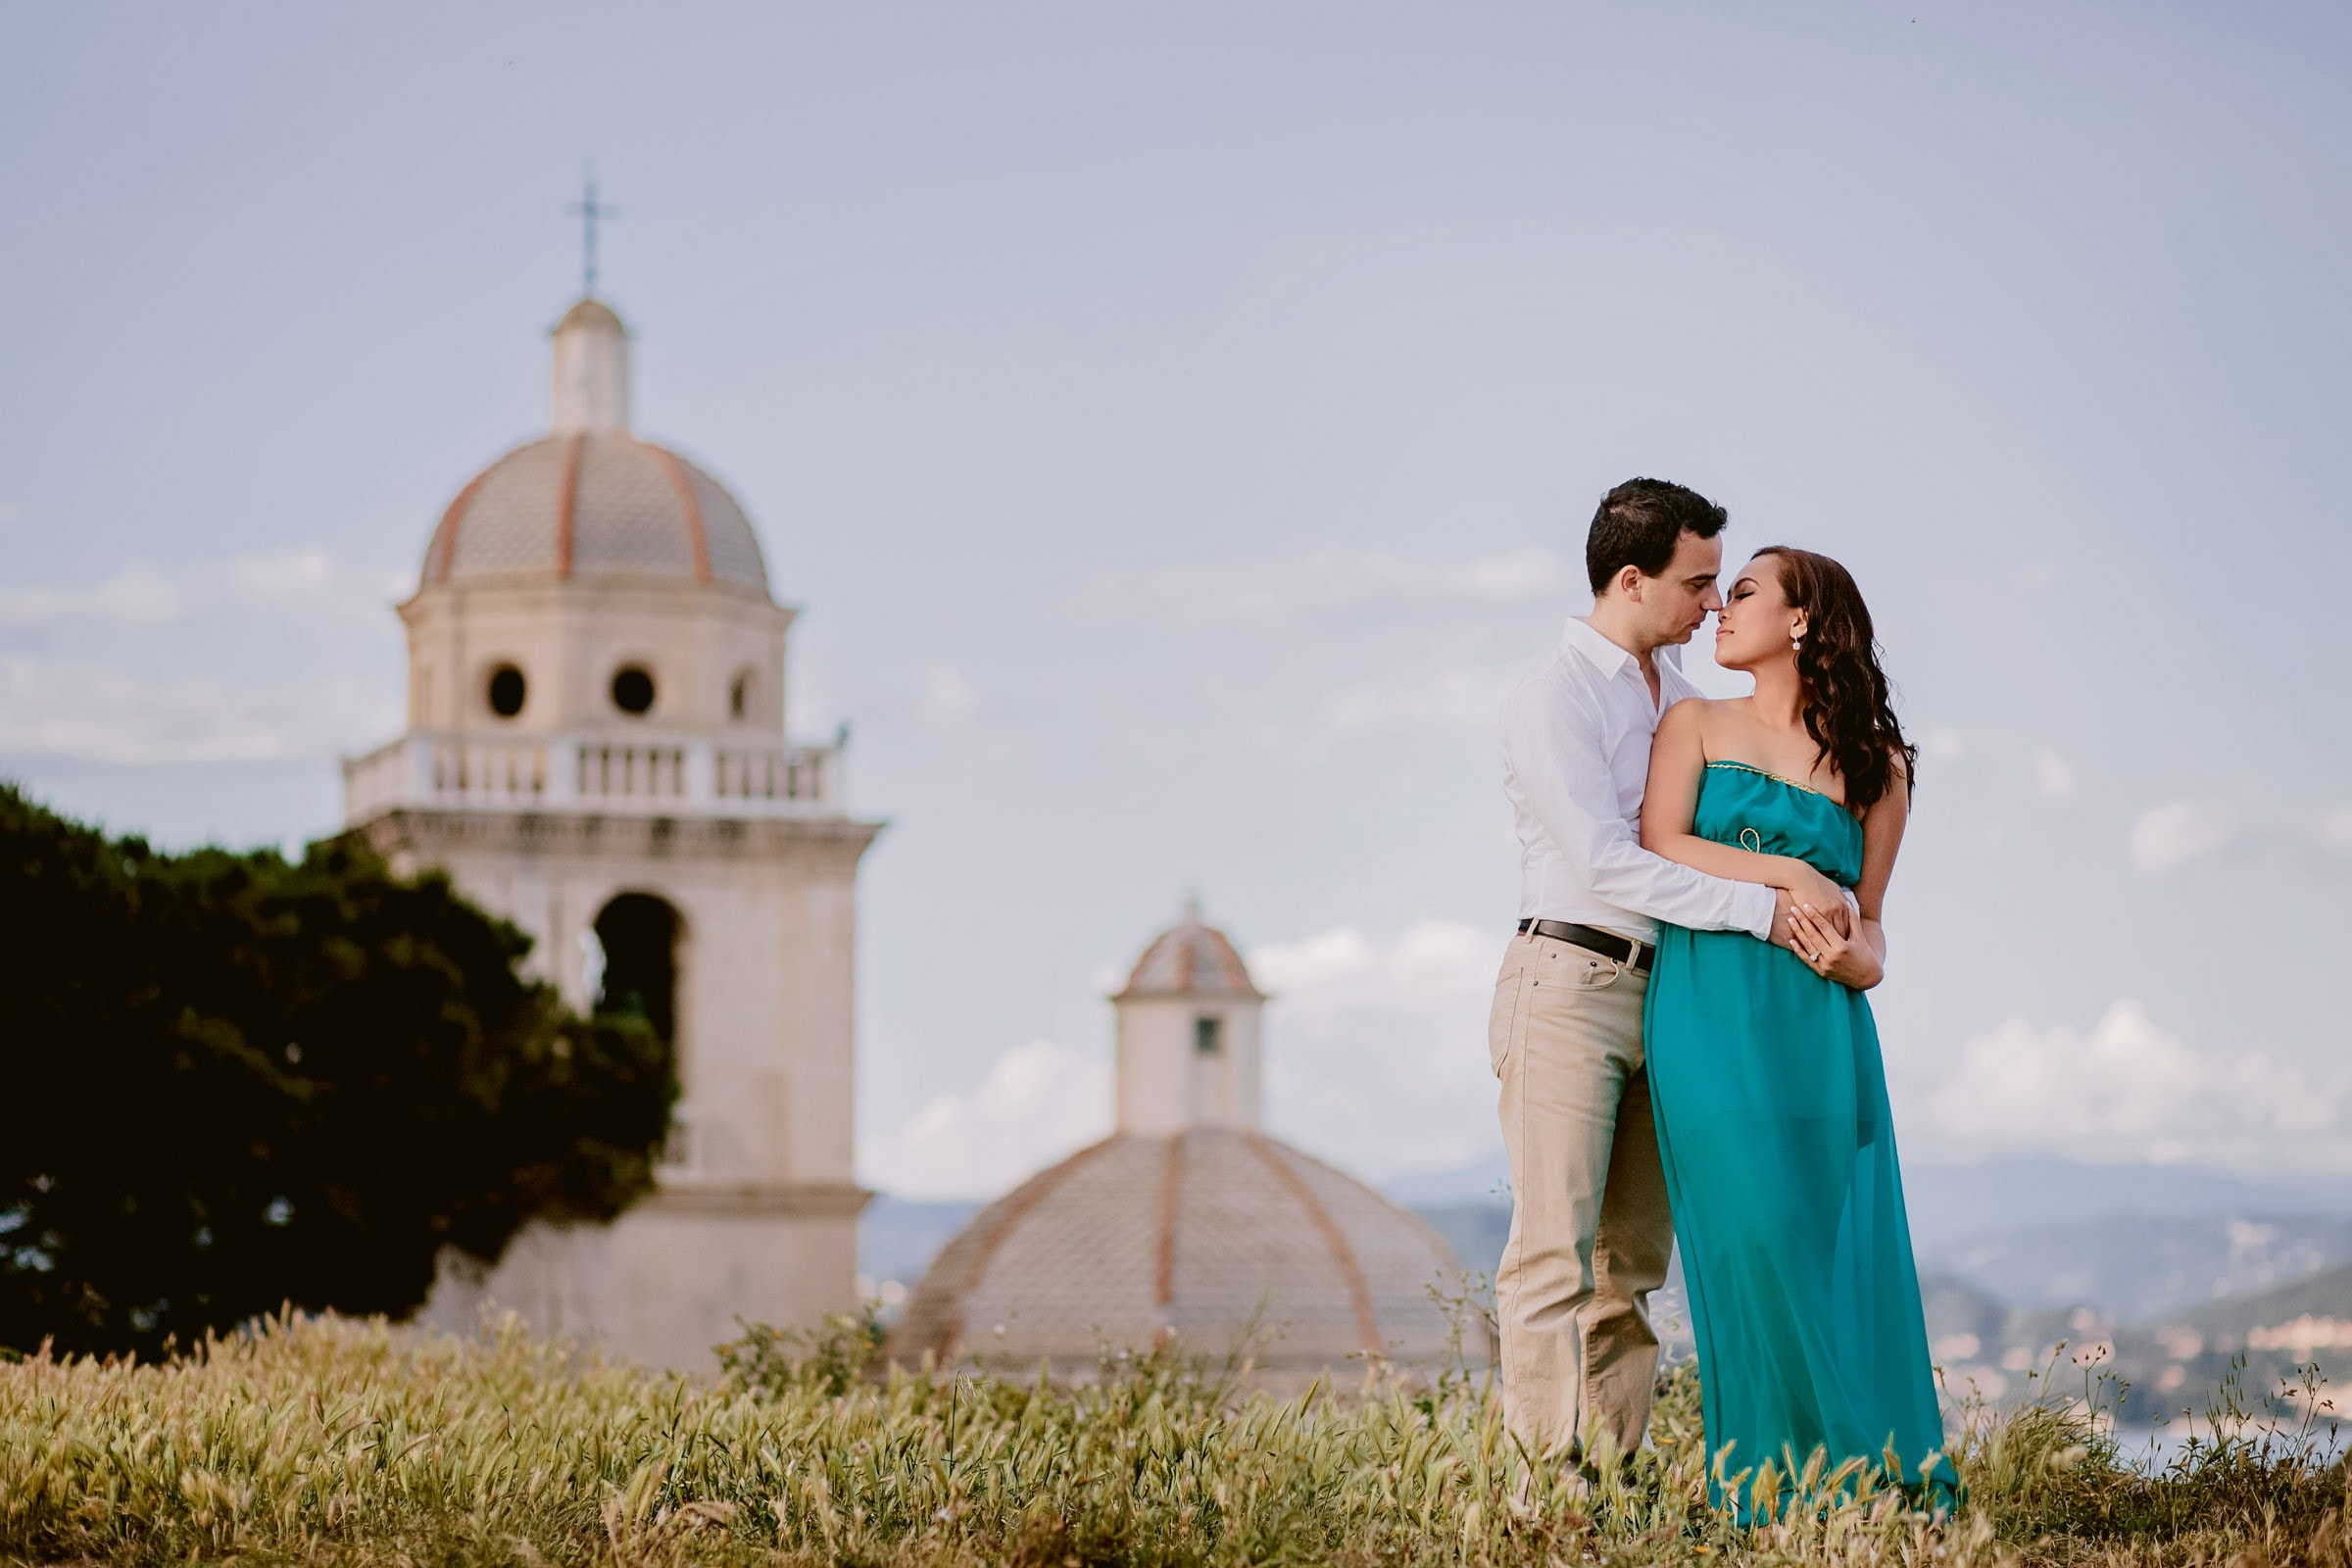 honeymoon photography in Portovenere